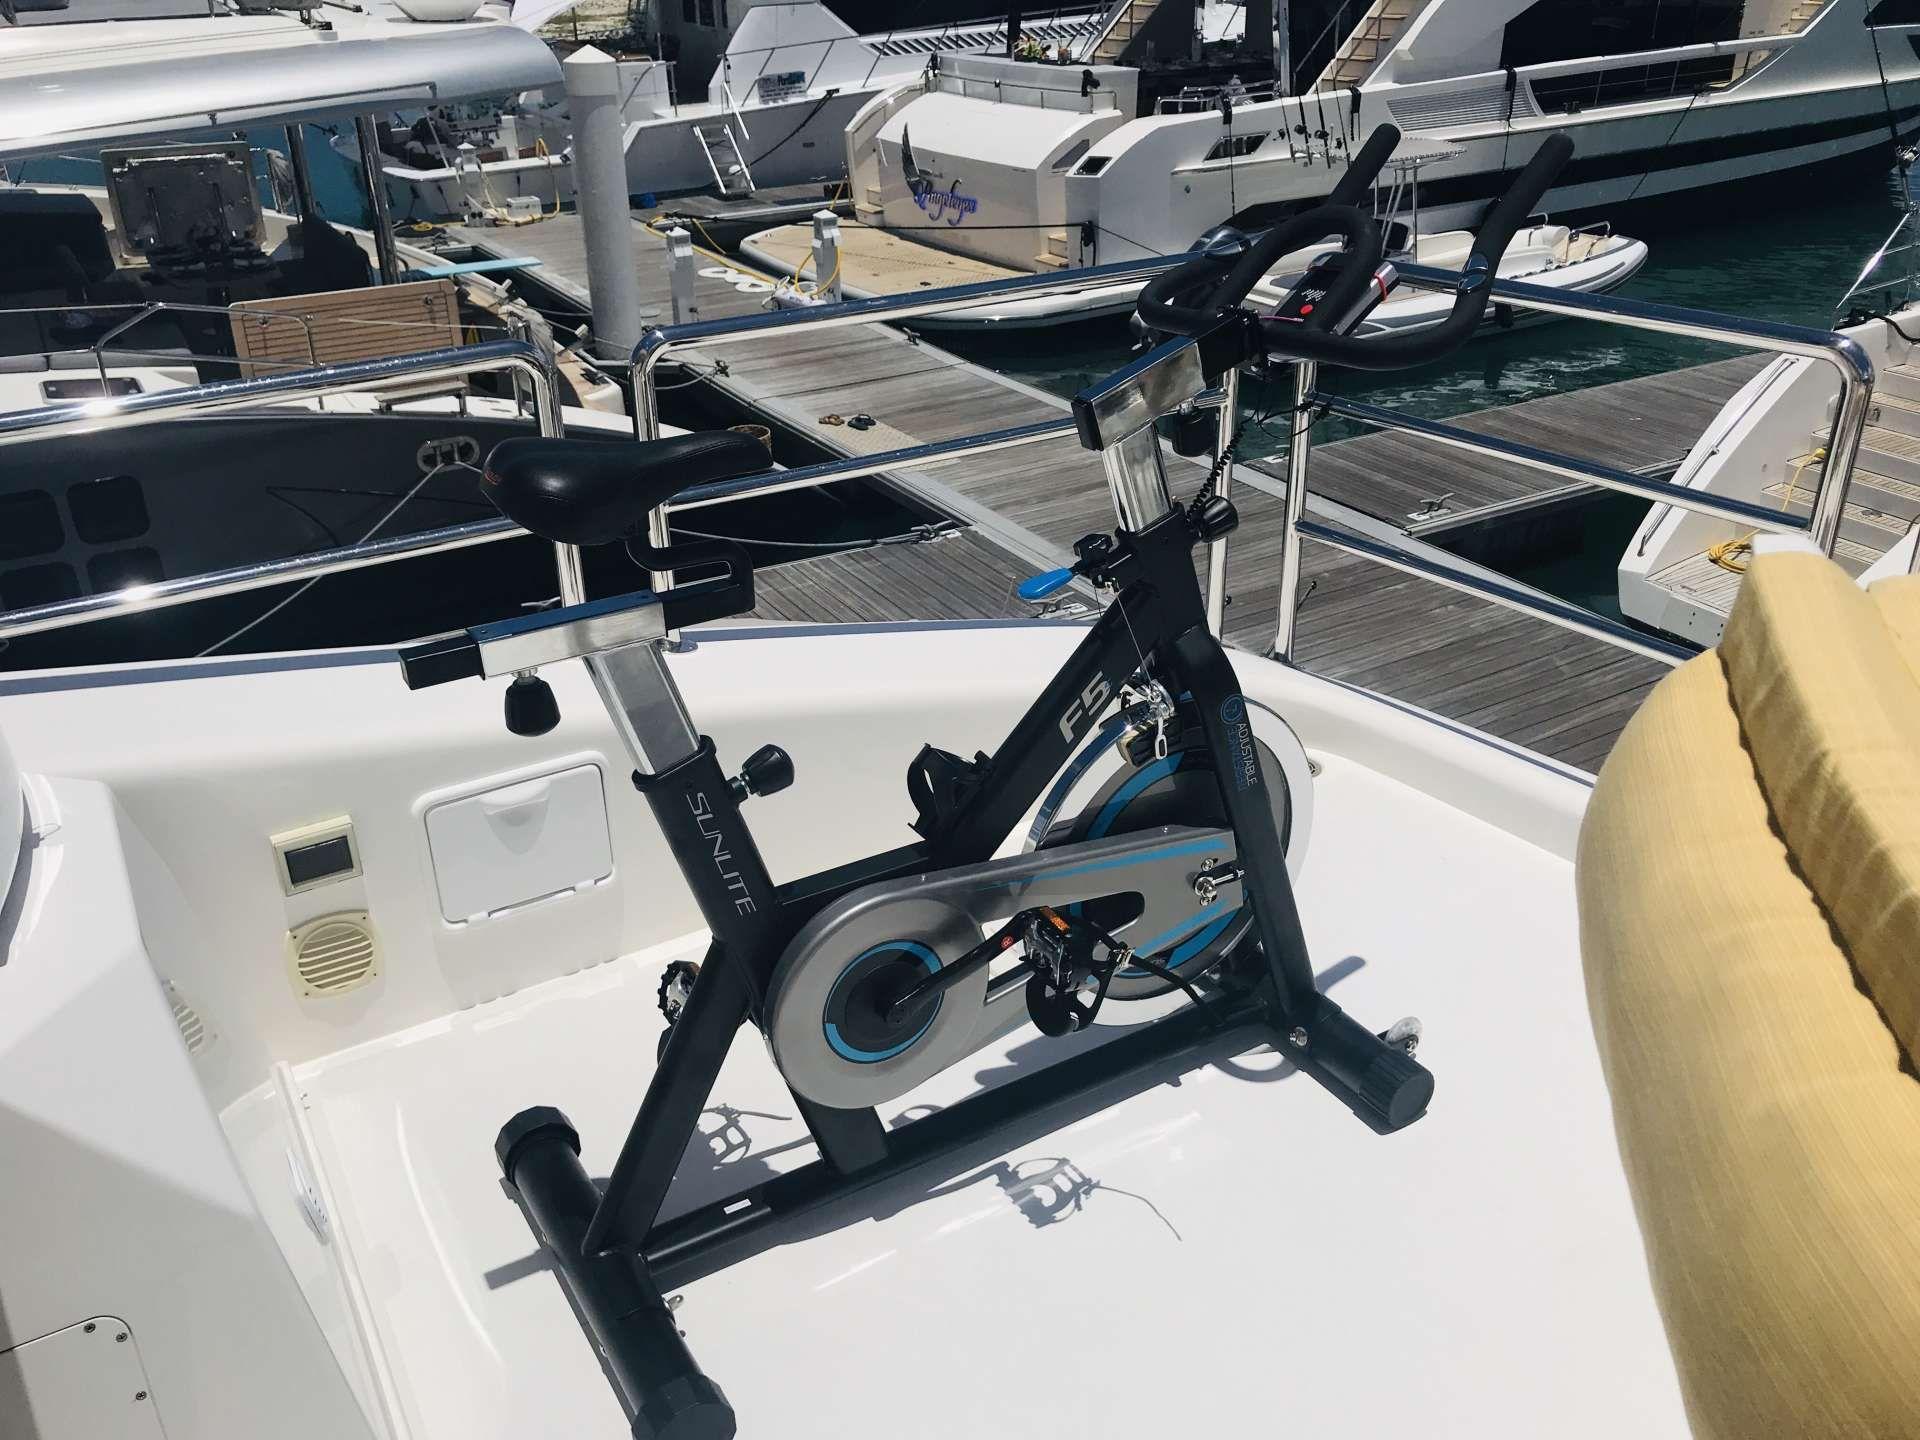 Horizon 60 SEA BOSS Fitness